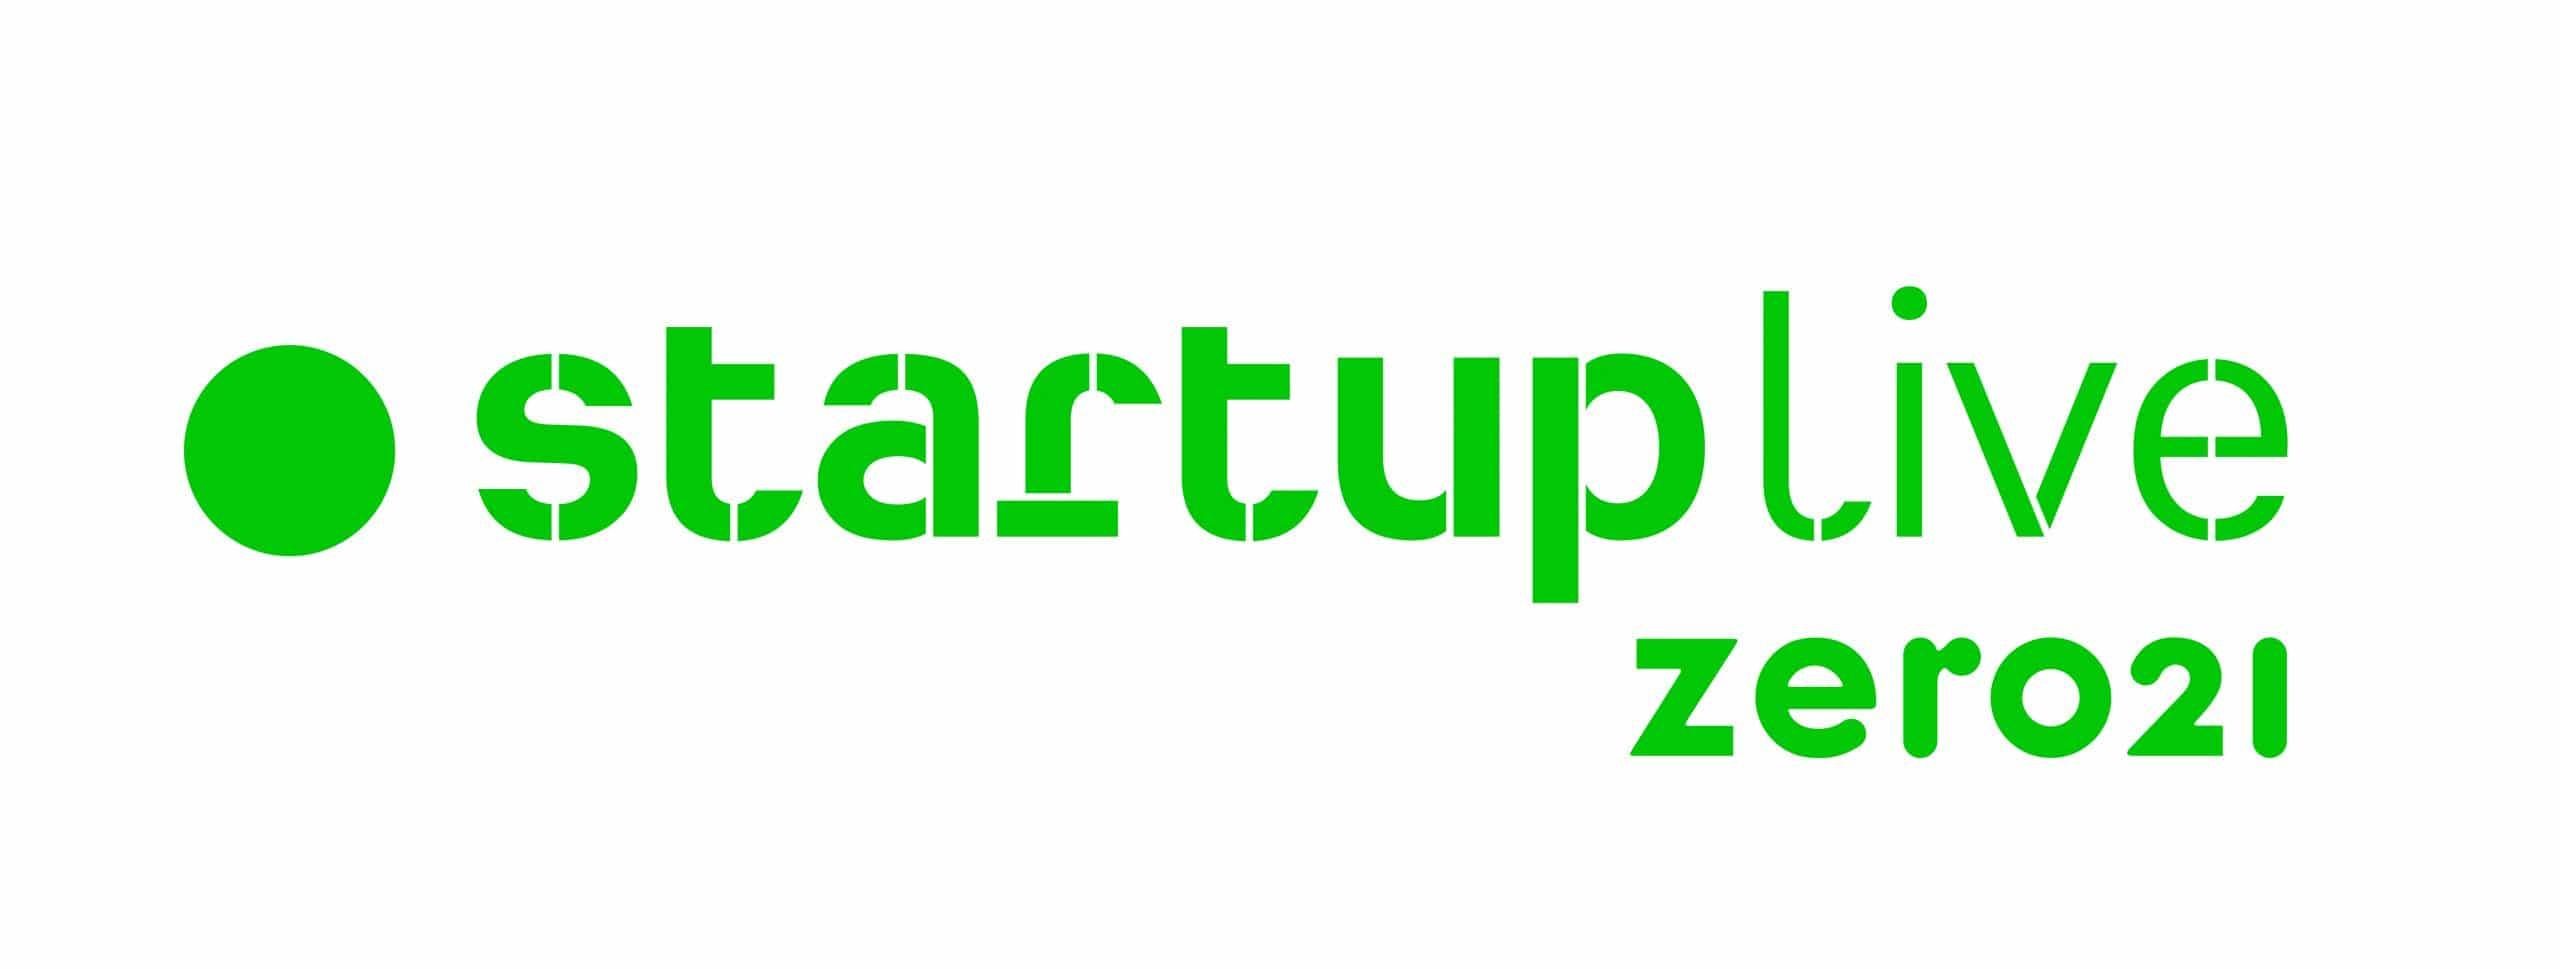 zero21 Startup Live